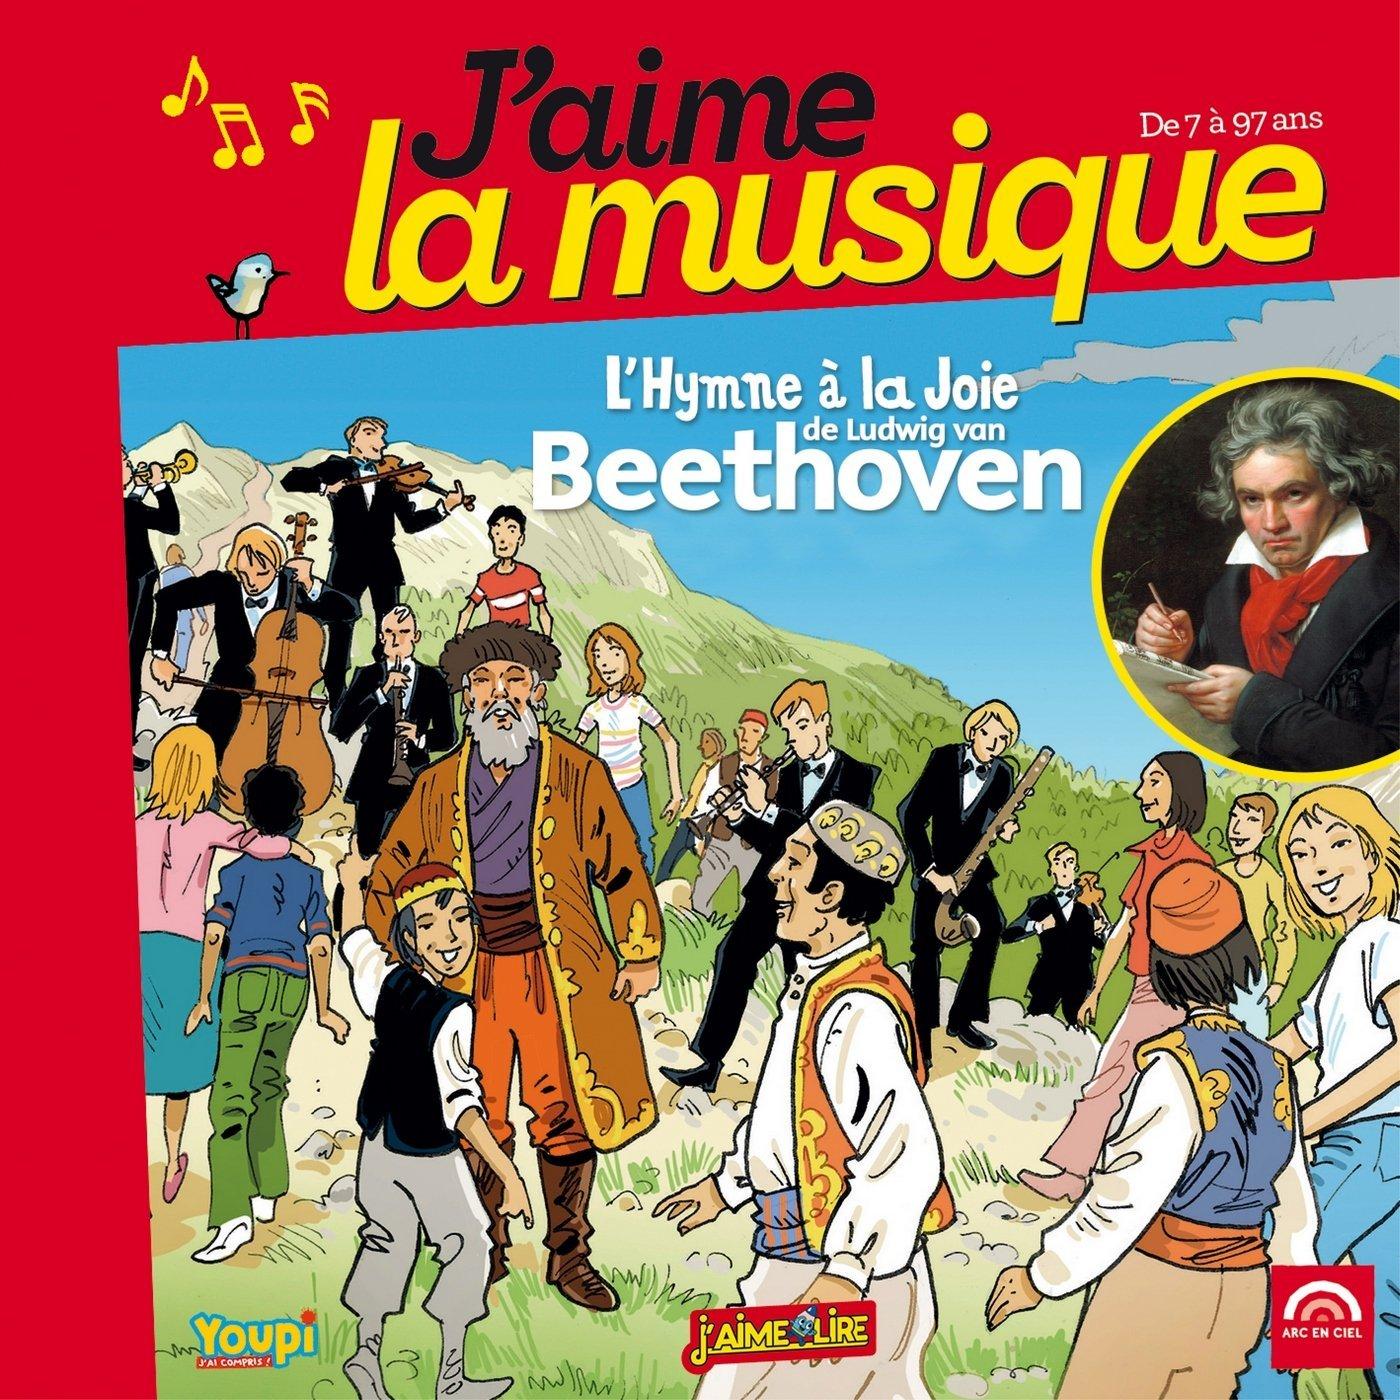 L'hymne à la joie de Ludwig van Beethoven Ludwig van Beethoven, comp. Emmanuel Cerisier, ill. Marianne Vourch, textes & narr.